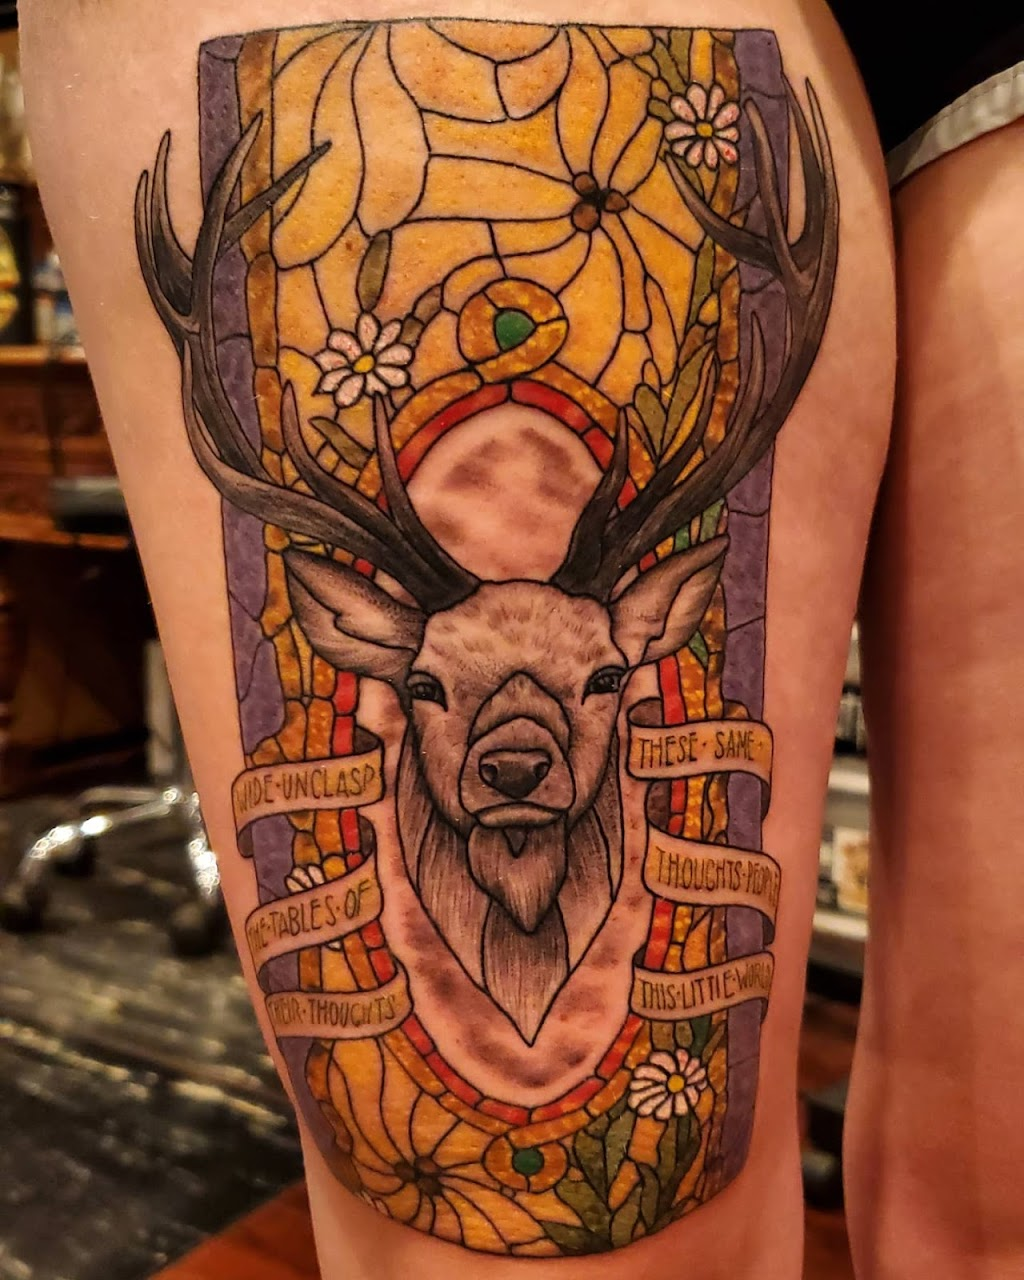 Still Life Tattoo - store  | Photo 3 of 10 | Address: 1500 CA-1 suite f, Seal Beach, CA 90740, USA | Phone: (562) 296-8066